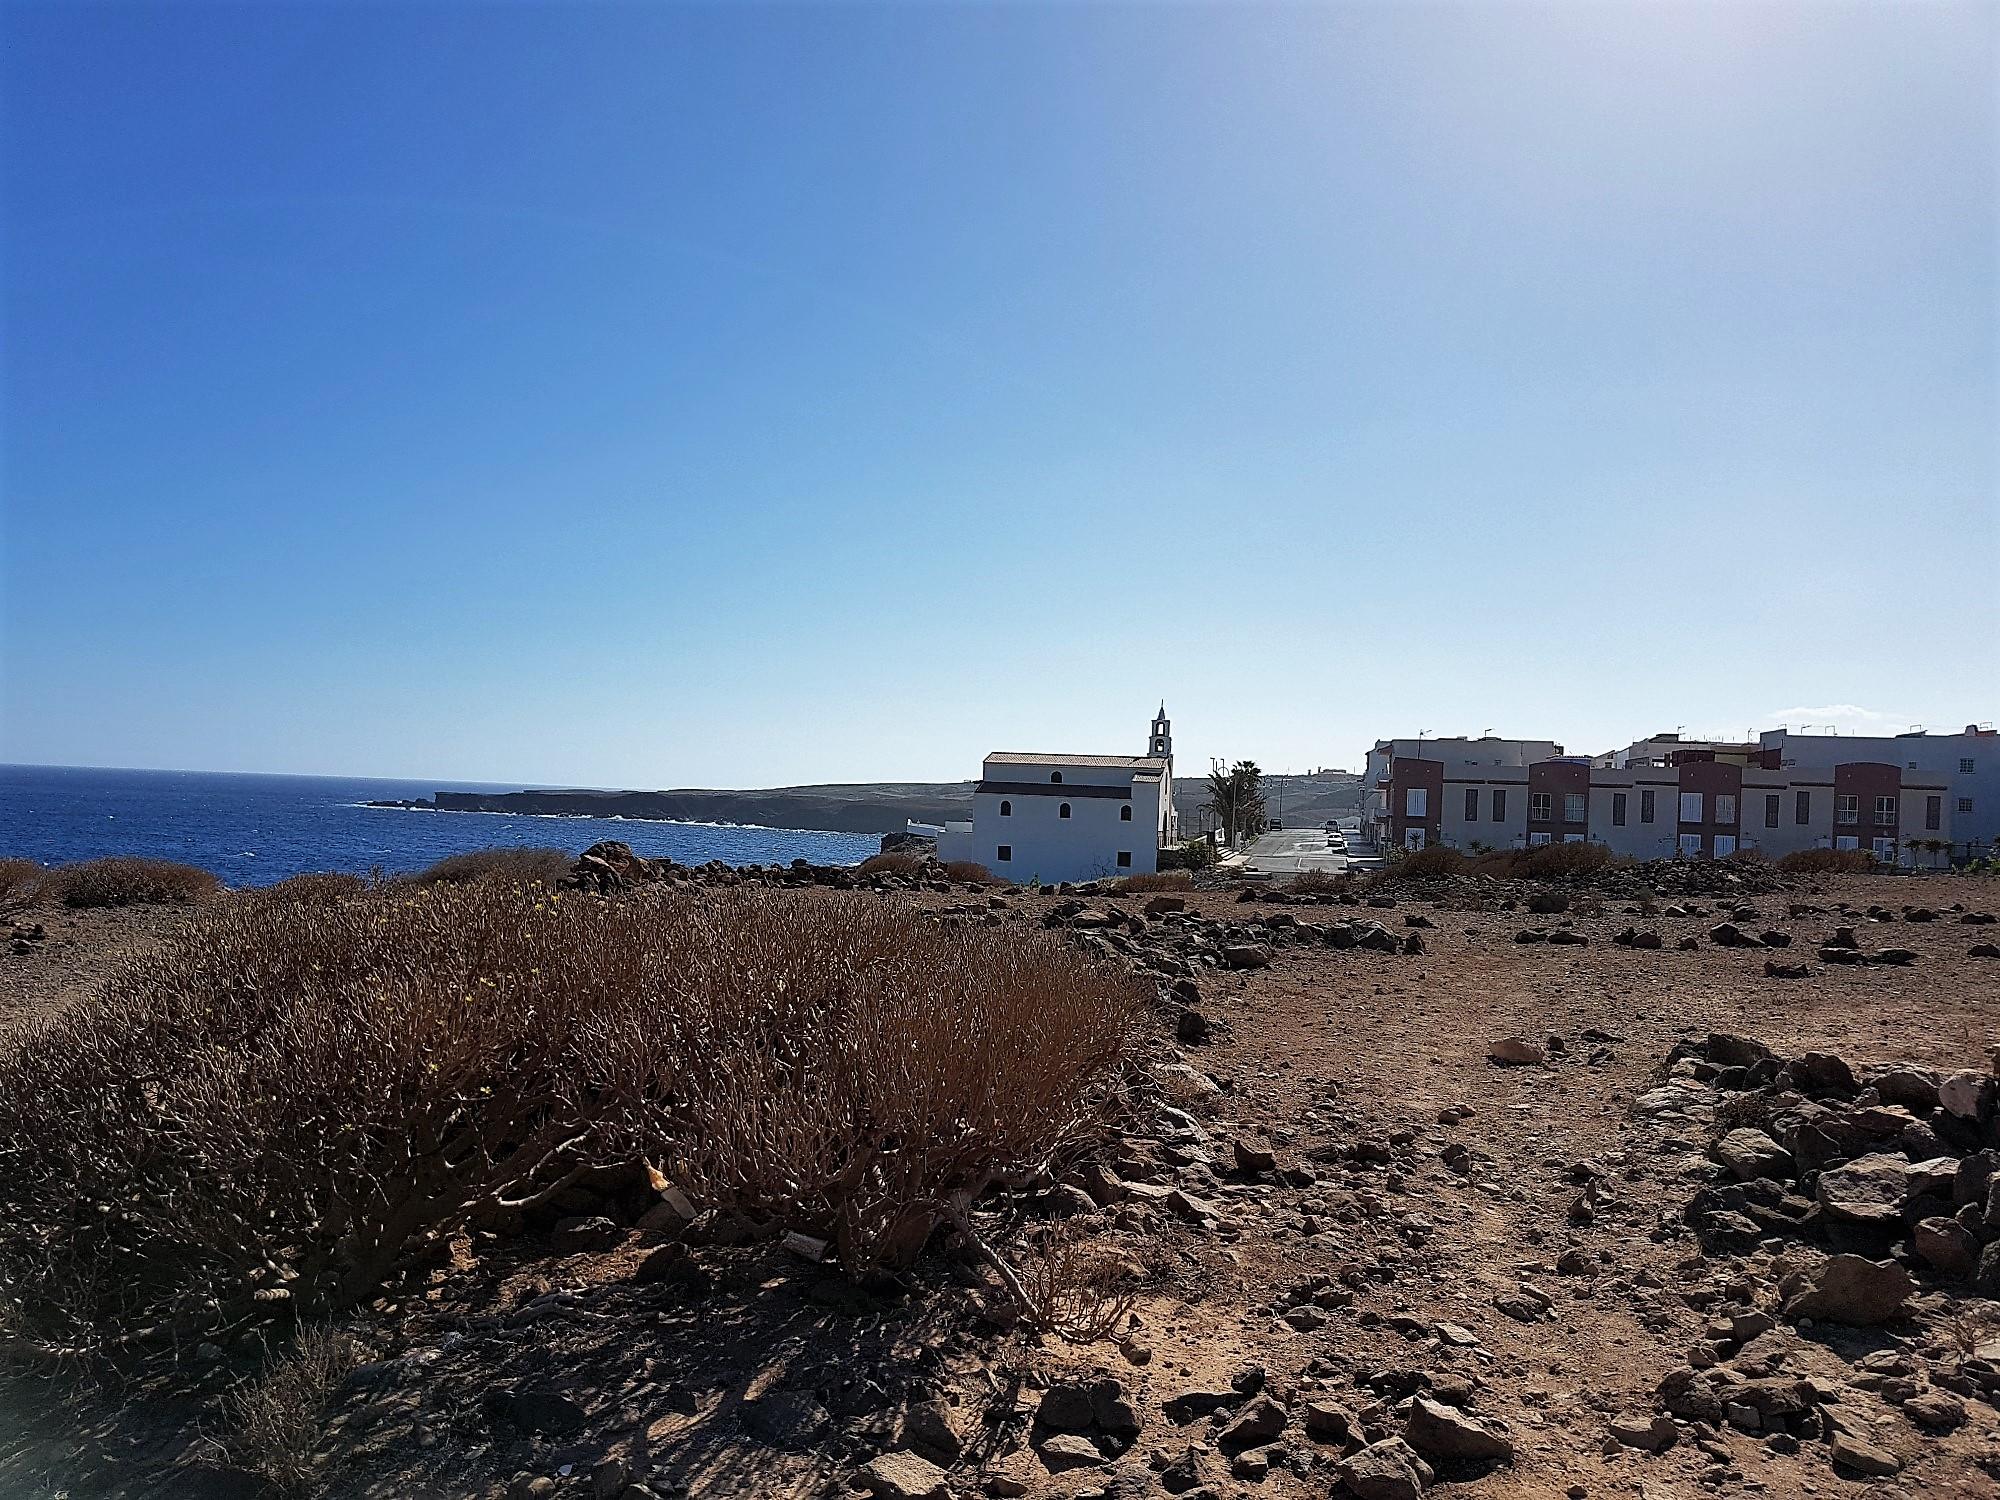 Ferienwohnung El Médano am Strand - La Caleta - Ort